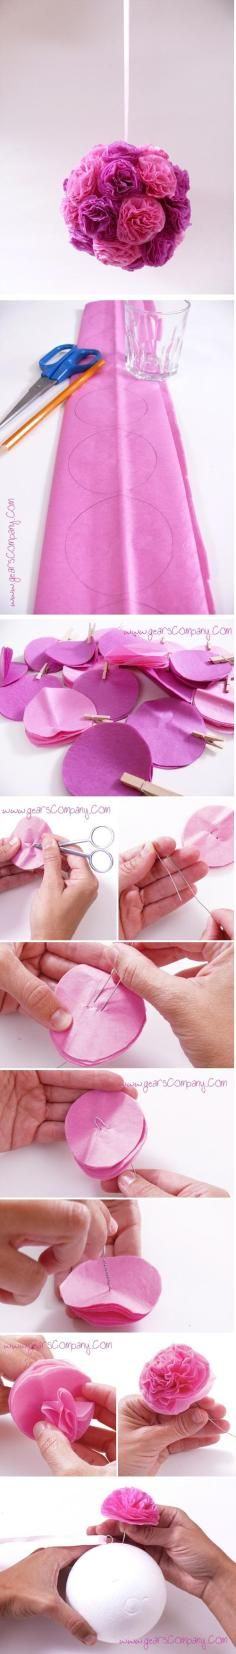 DIY Tutorial DIY Arts &  Crafts / DIY Girls Birthday Themes - Bead&Cord